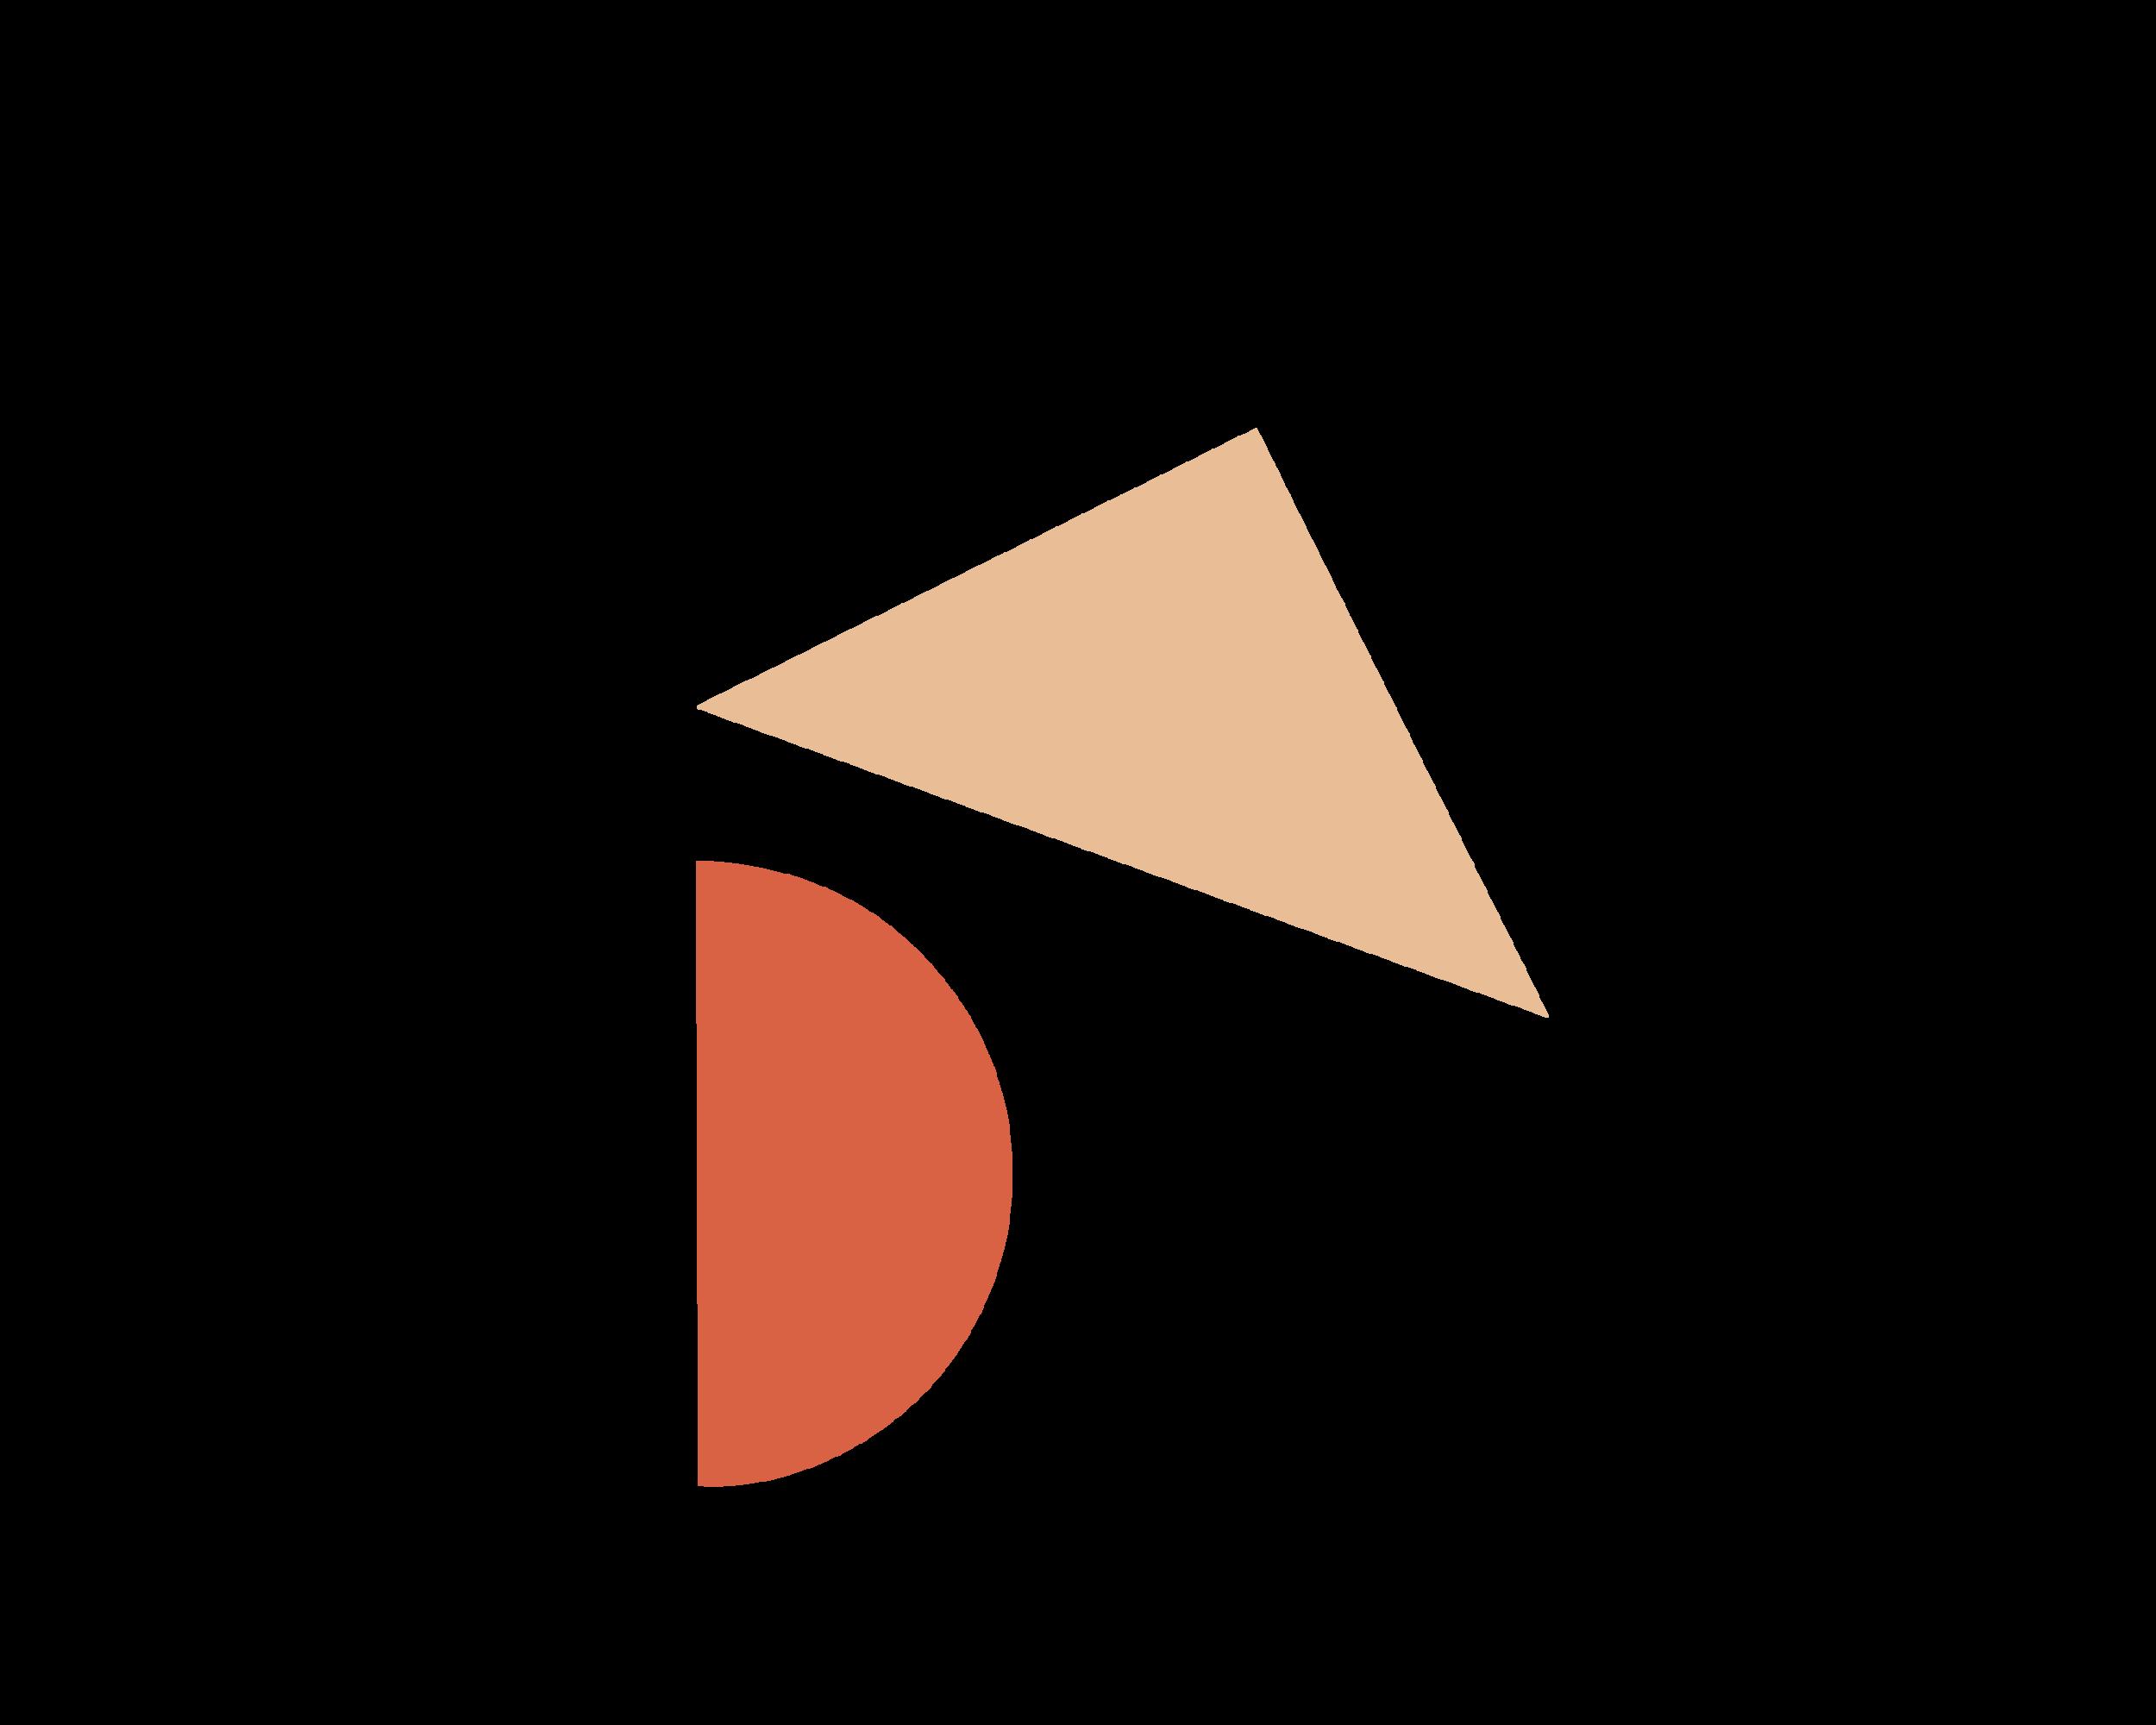 nns_shapes_r1-10.png